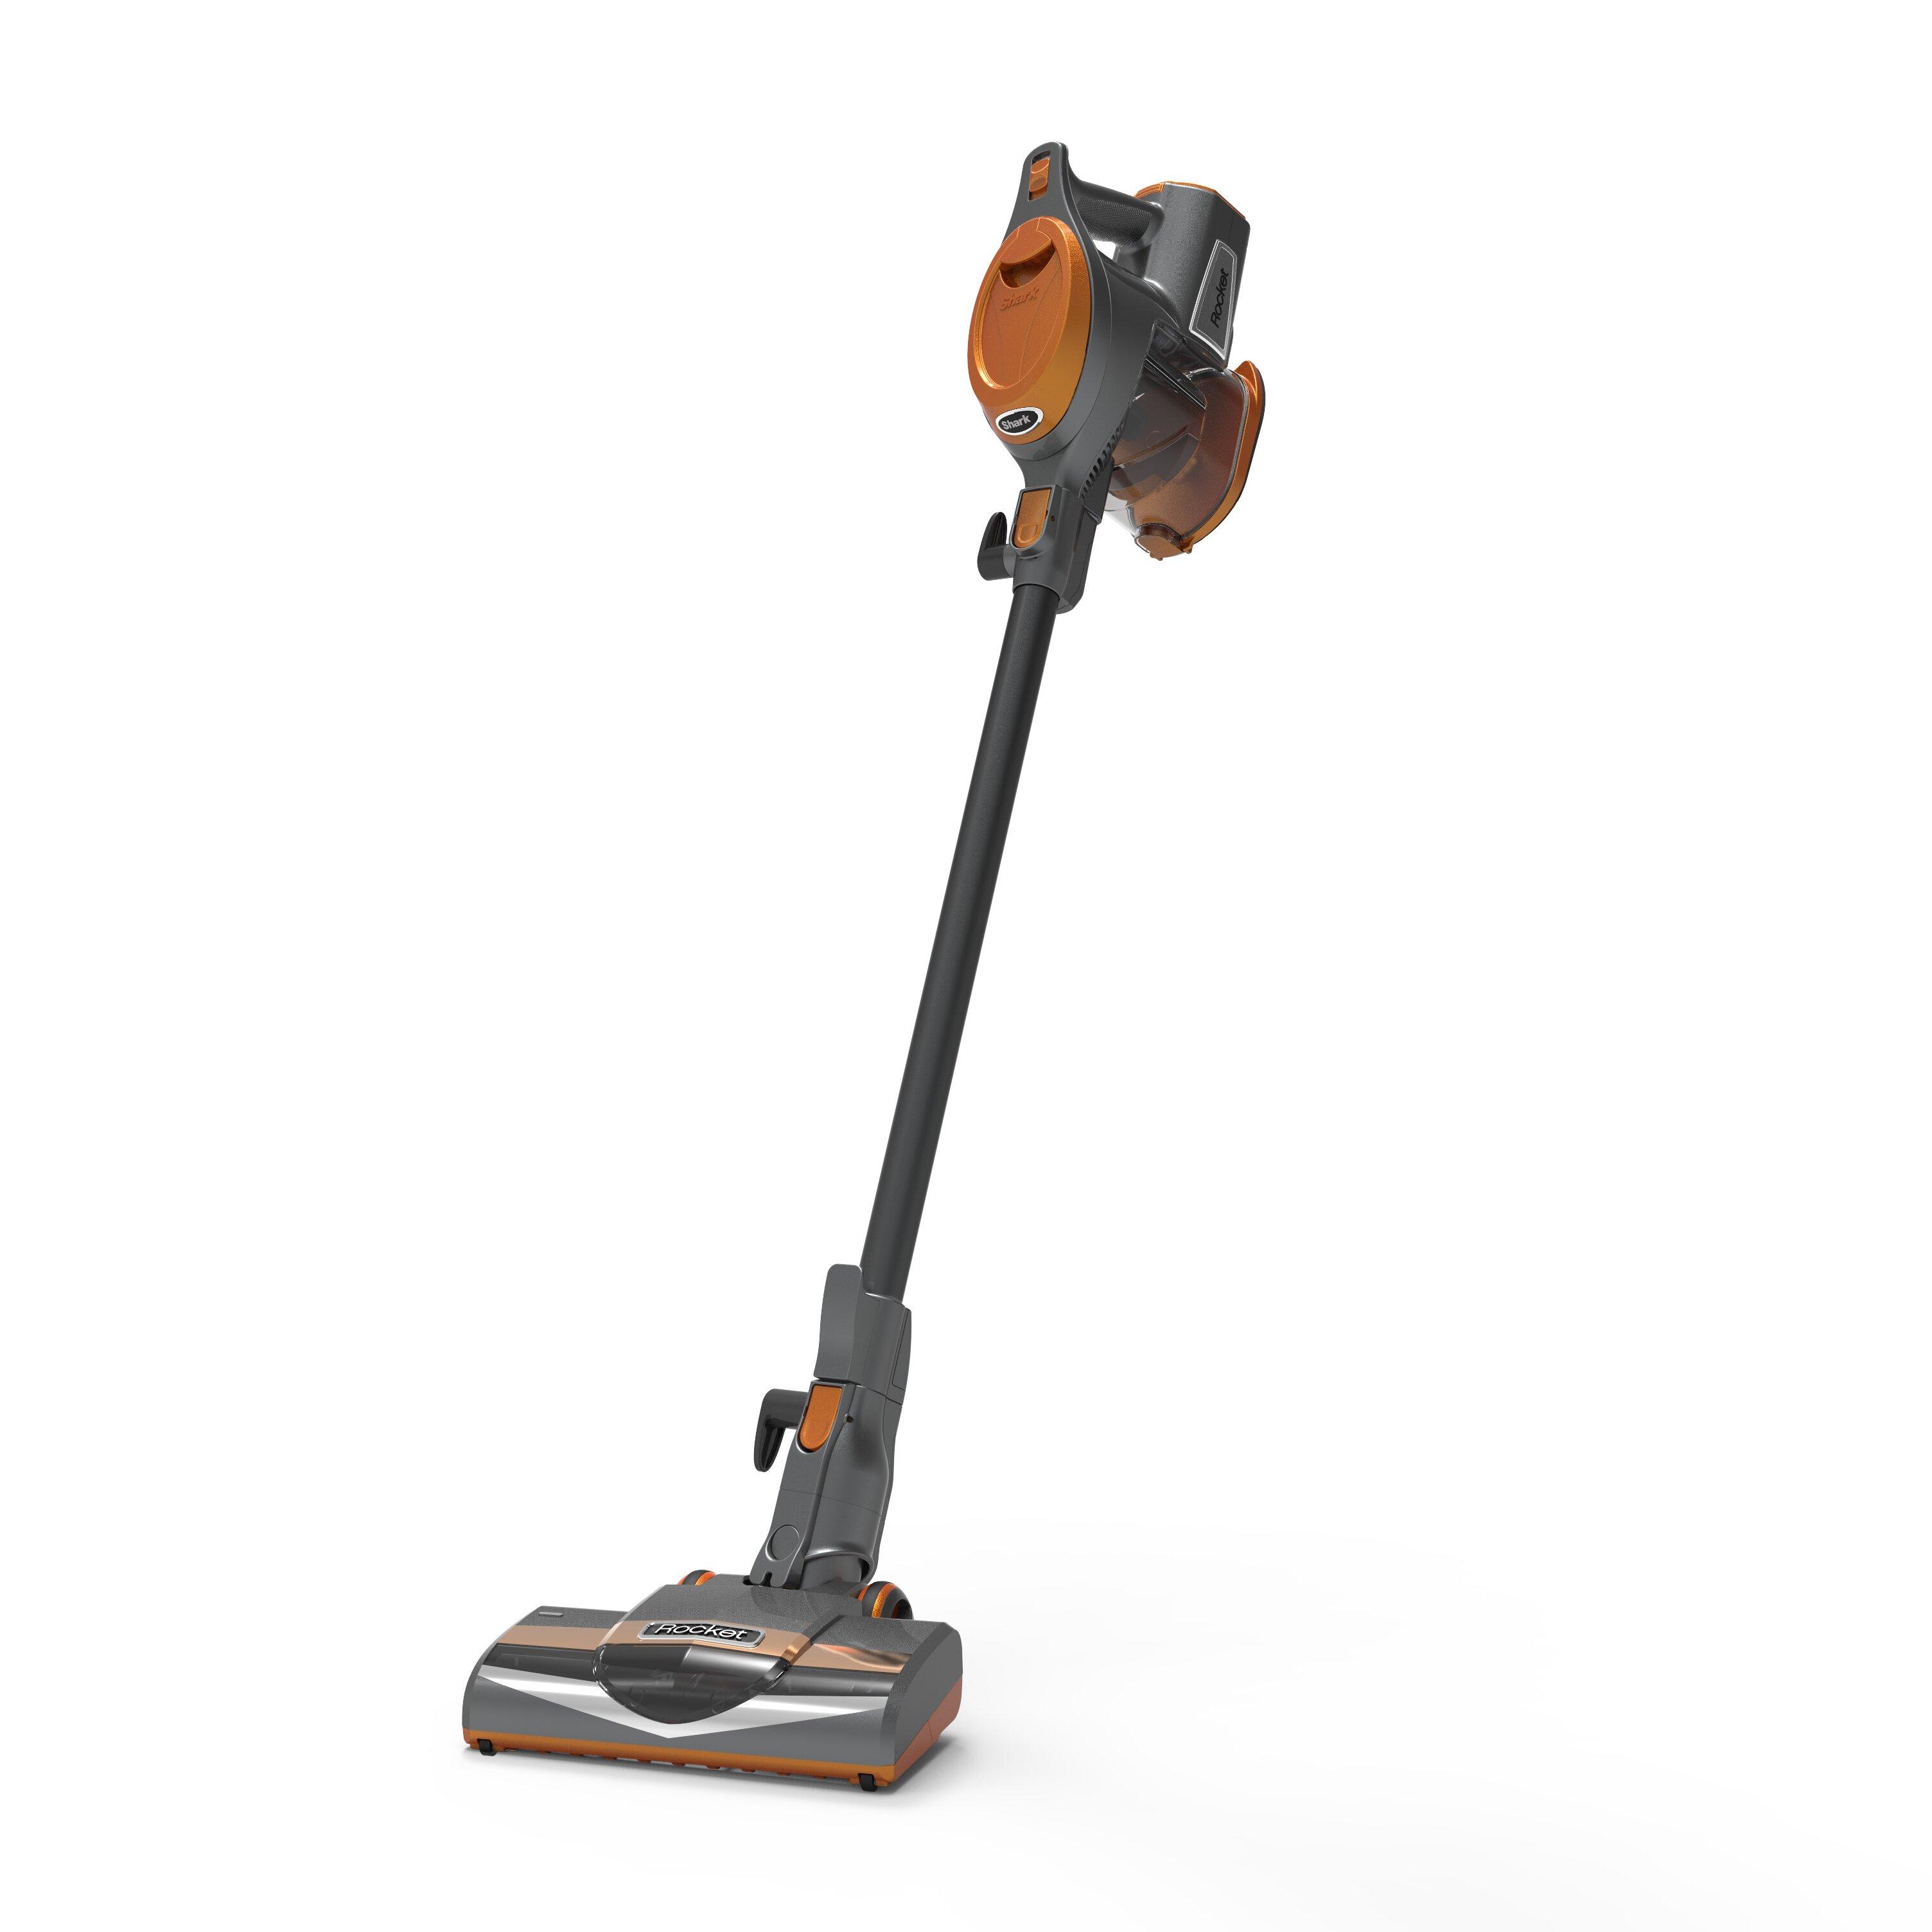 shark shark rocket ultra light stick vacuum reviews. Black Bedroom Furniture Sets. Home Design Ideas